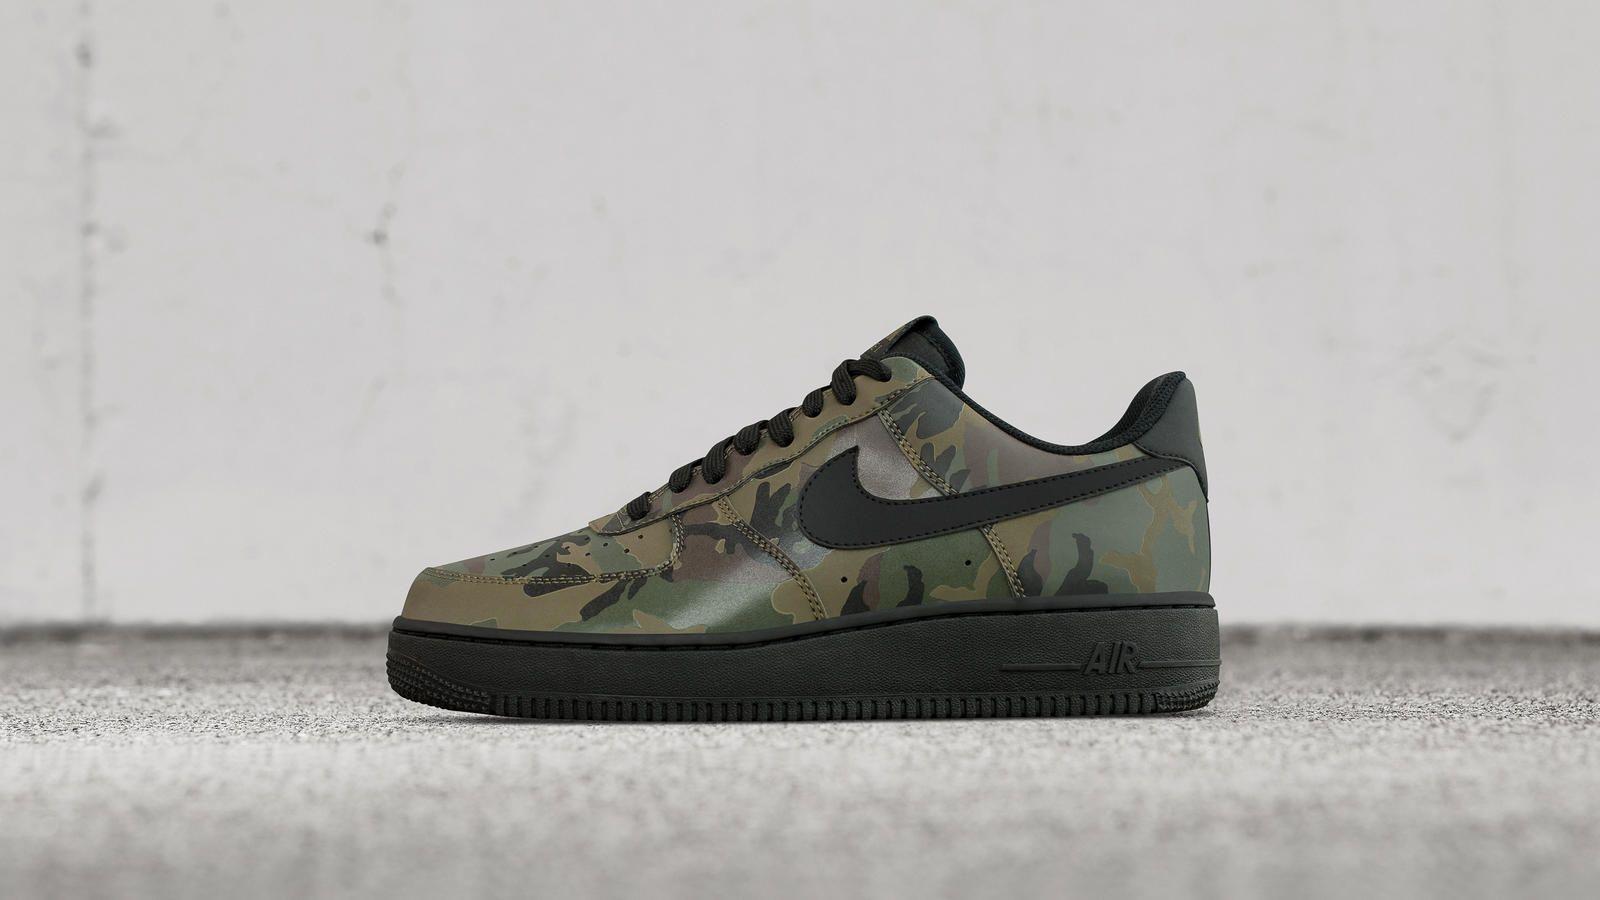 Nike Air Force 1 Low Camo Pack Jesien 2016 Calzado Nike Zapatillas Zapatos